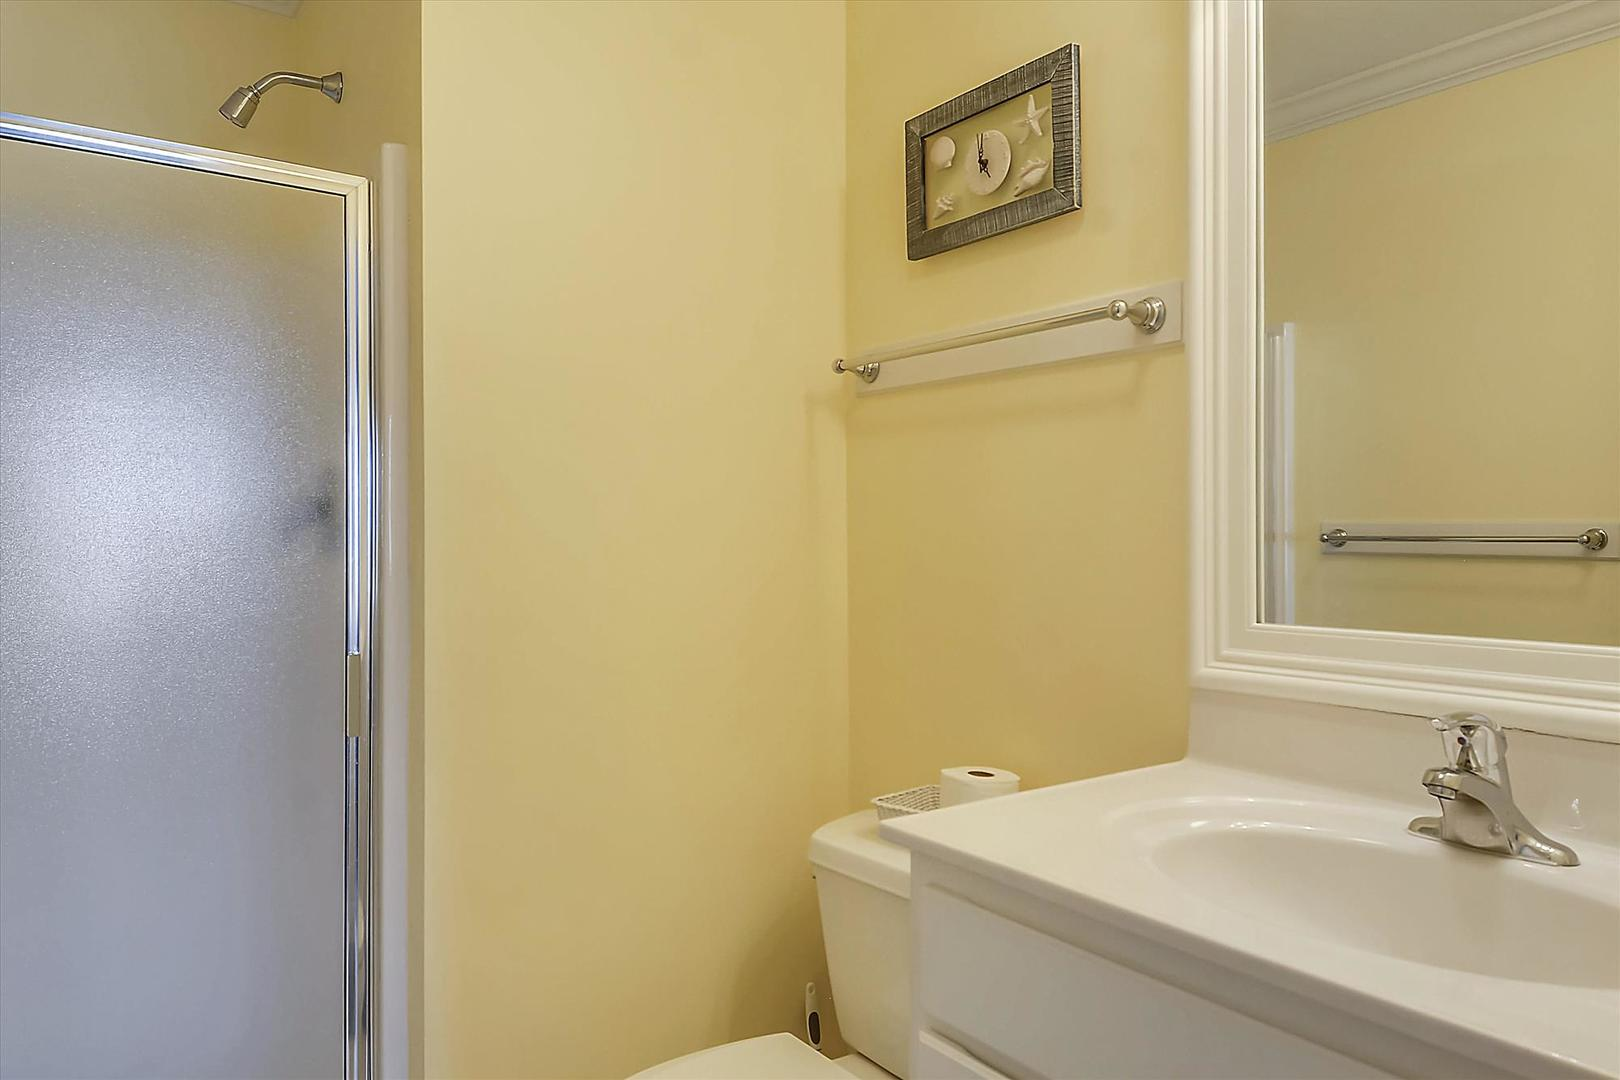 Bayville Shores 1169 - Upper Level Master Bathroom 1